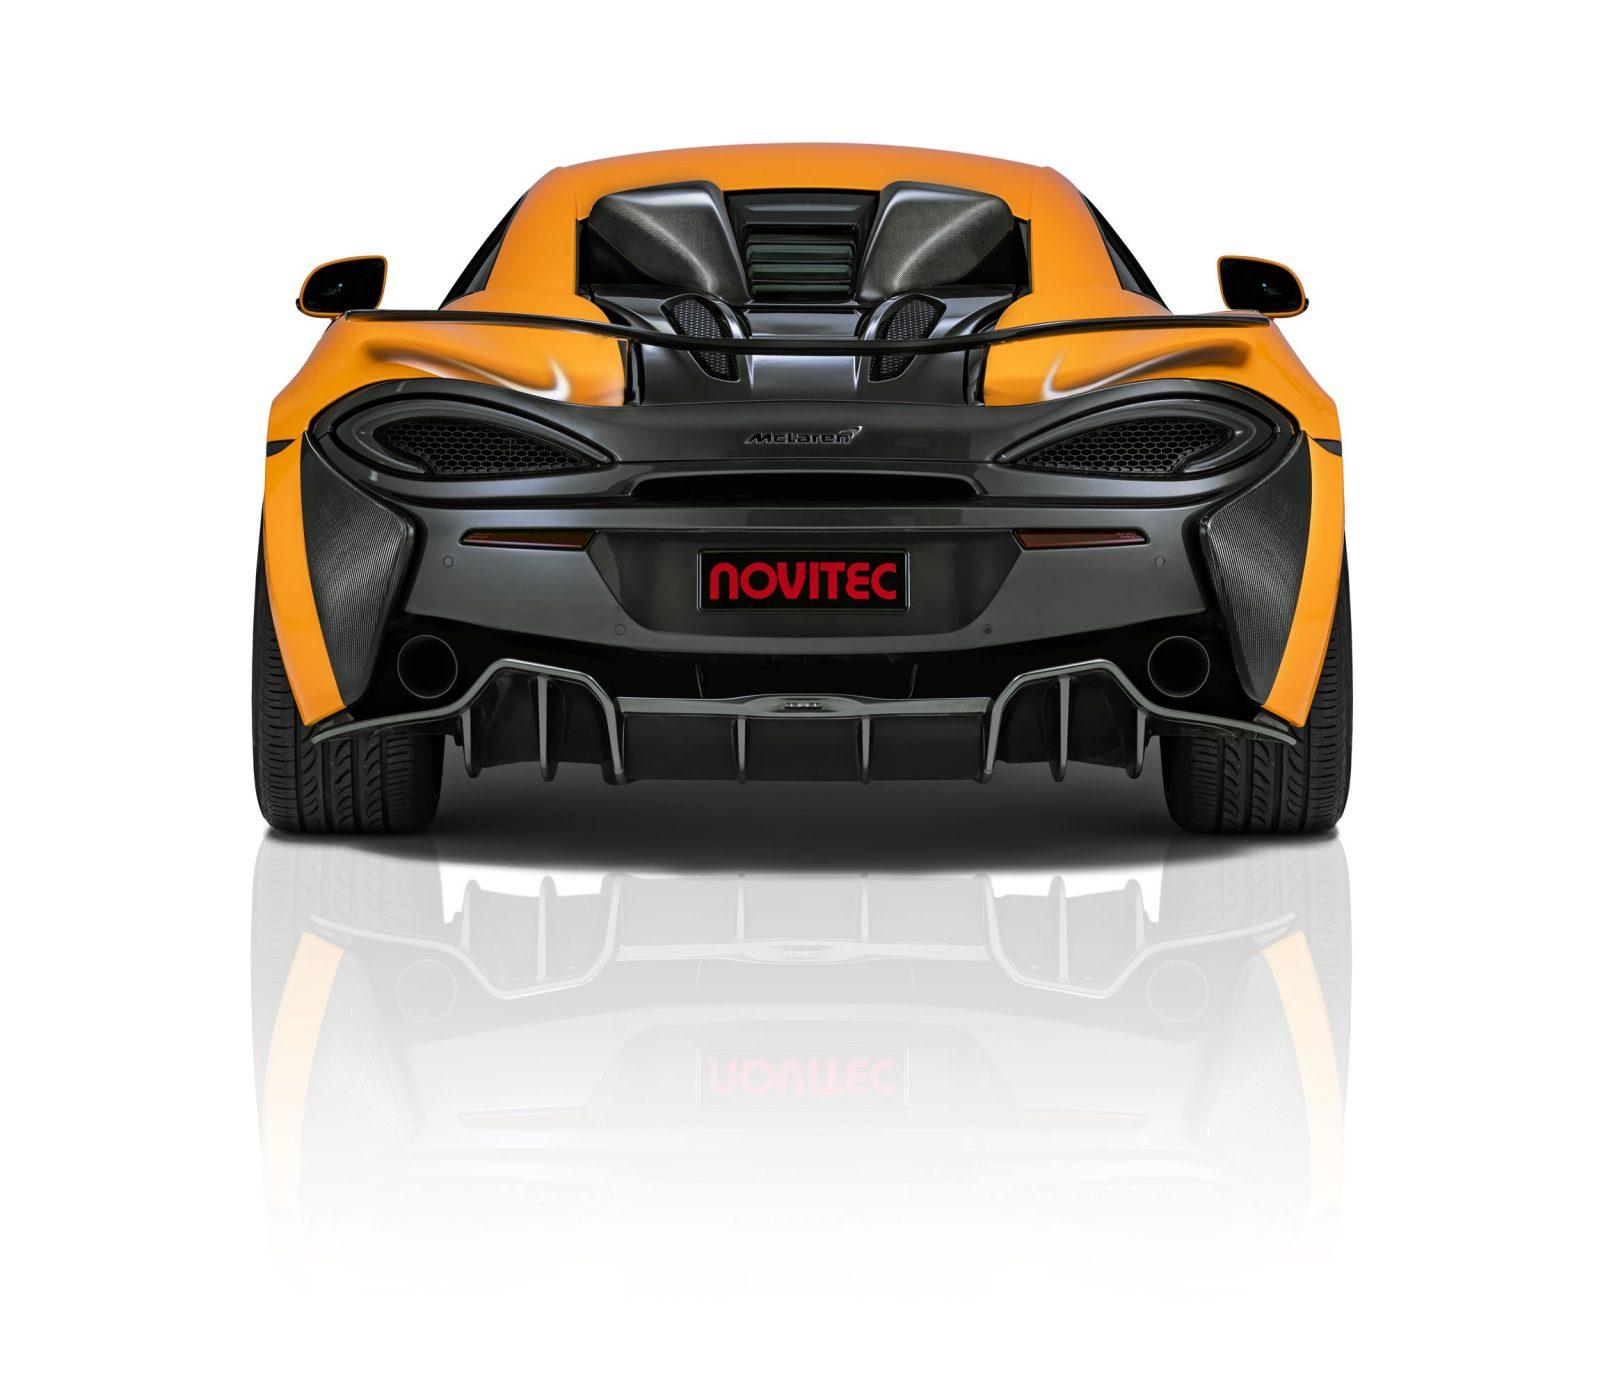 2017 Mclaren 570s Camshaft: 2.9s, 646HP 2017 Novitec MCL57 McLaren 570S » CAR SHOPPING